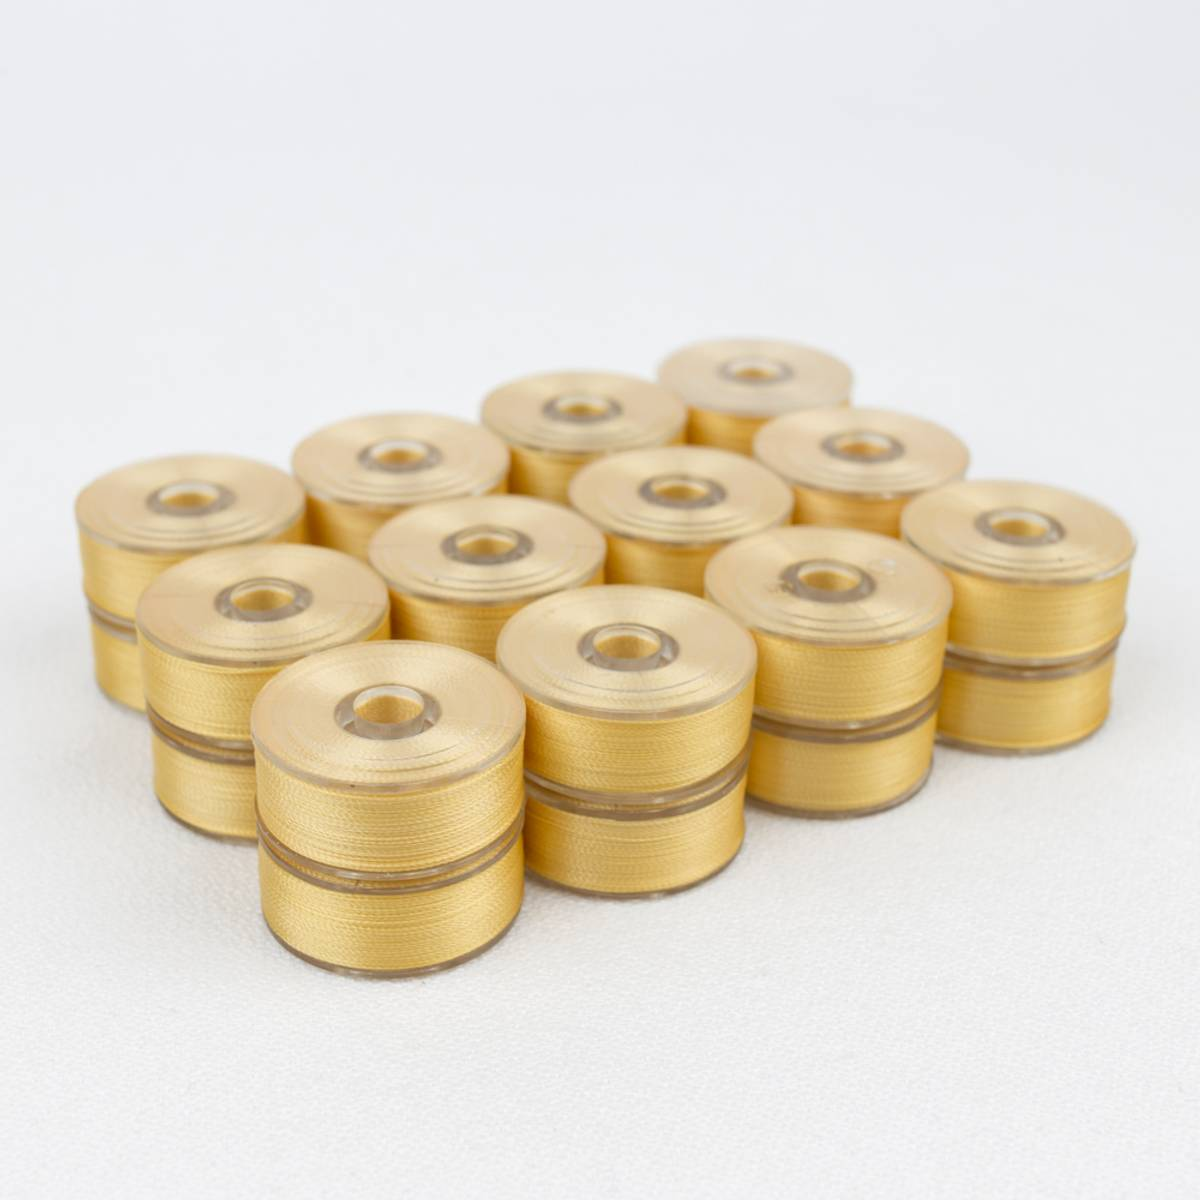 12stk ferdigspolet undertråd soft gold, DB138